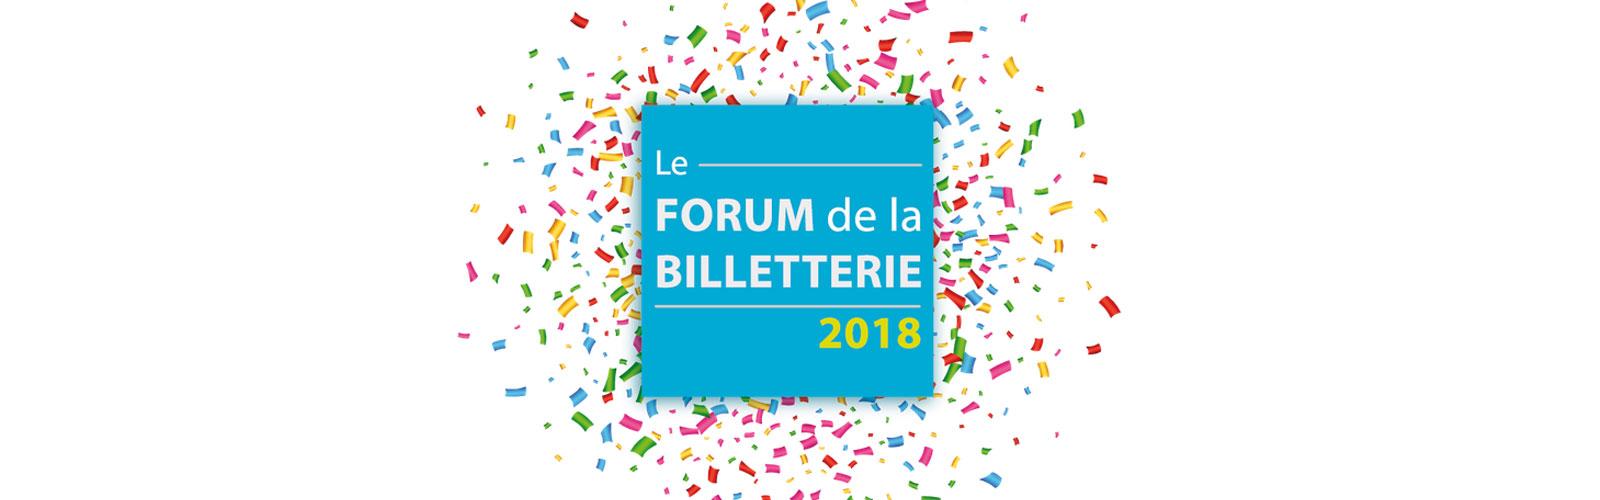 forum-billetterie-2018